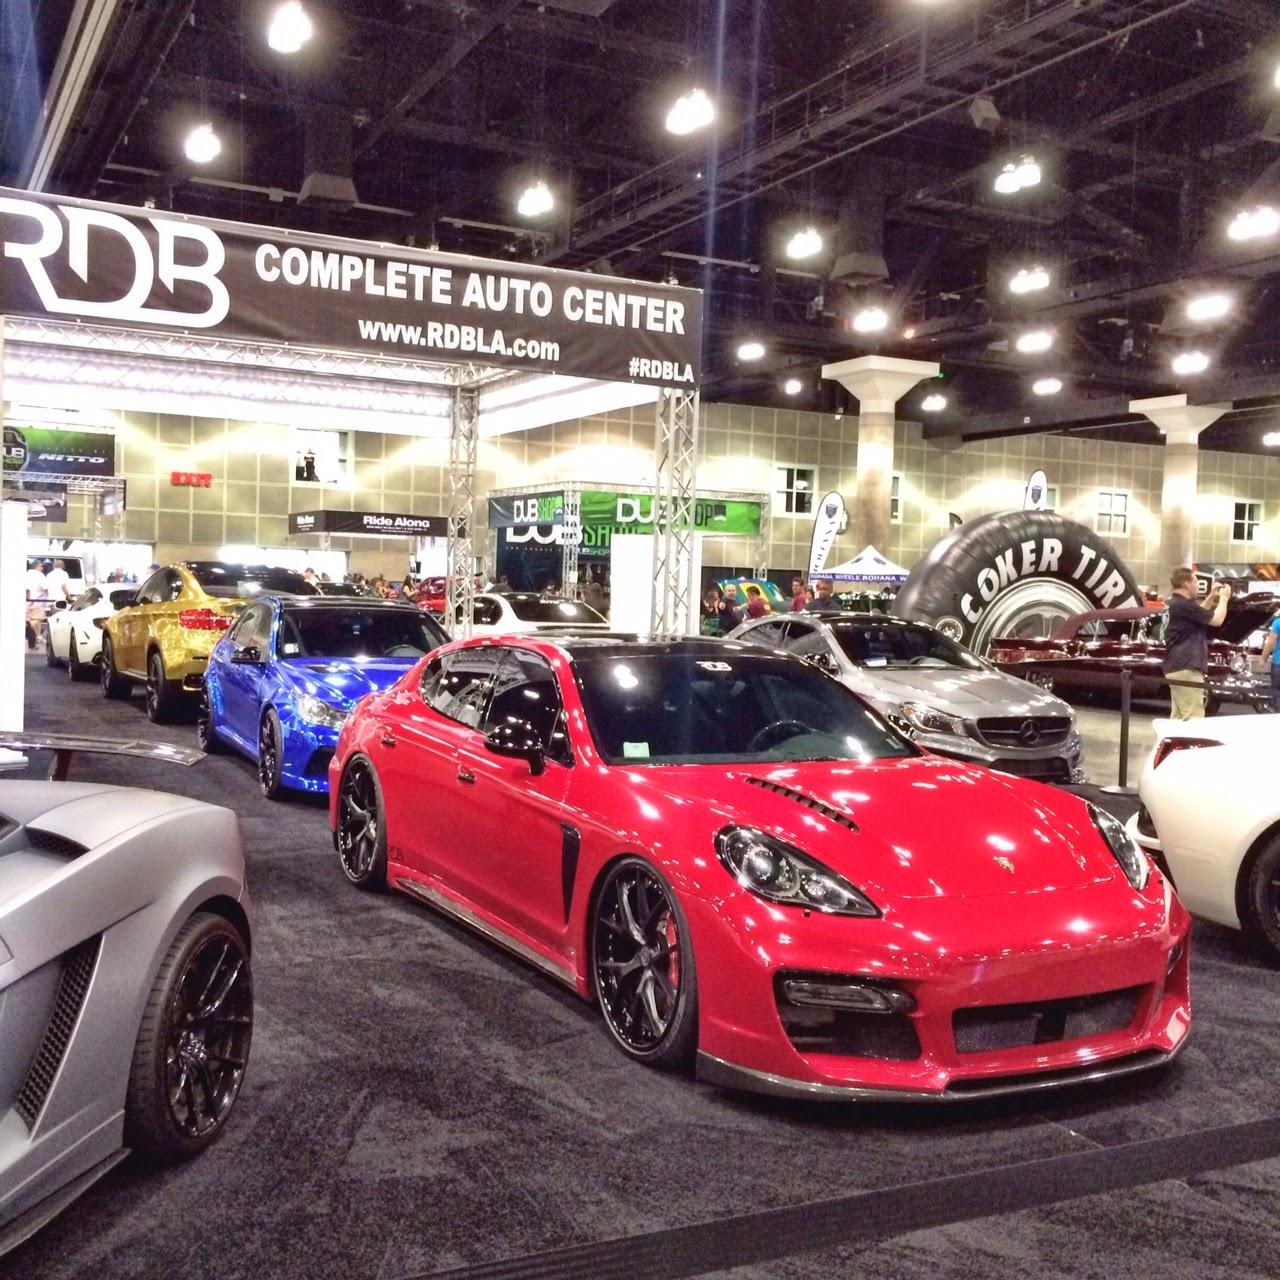 Car Show Coverage: 2014 Dub Car Show: Los Angeles